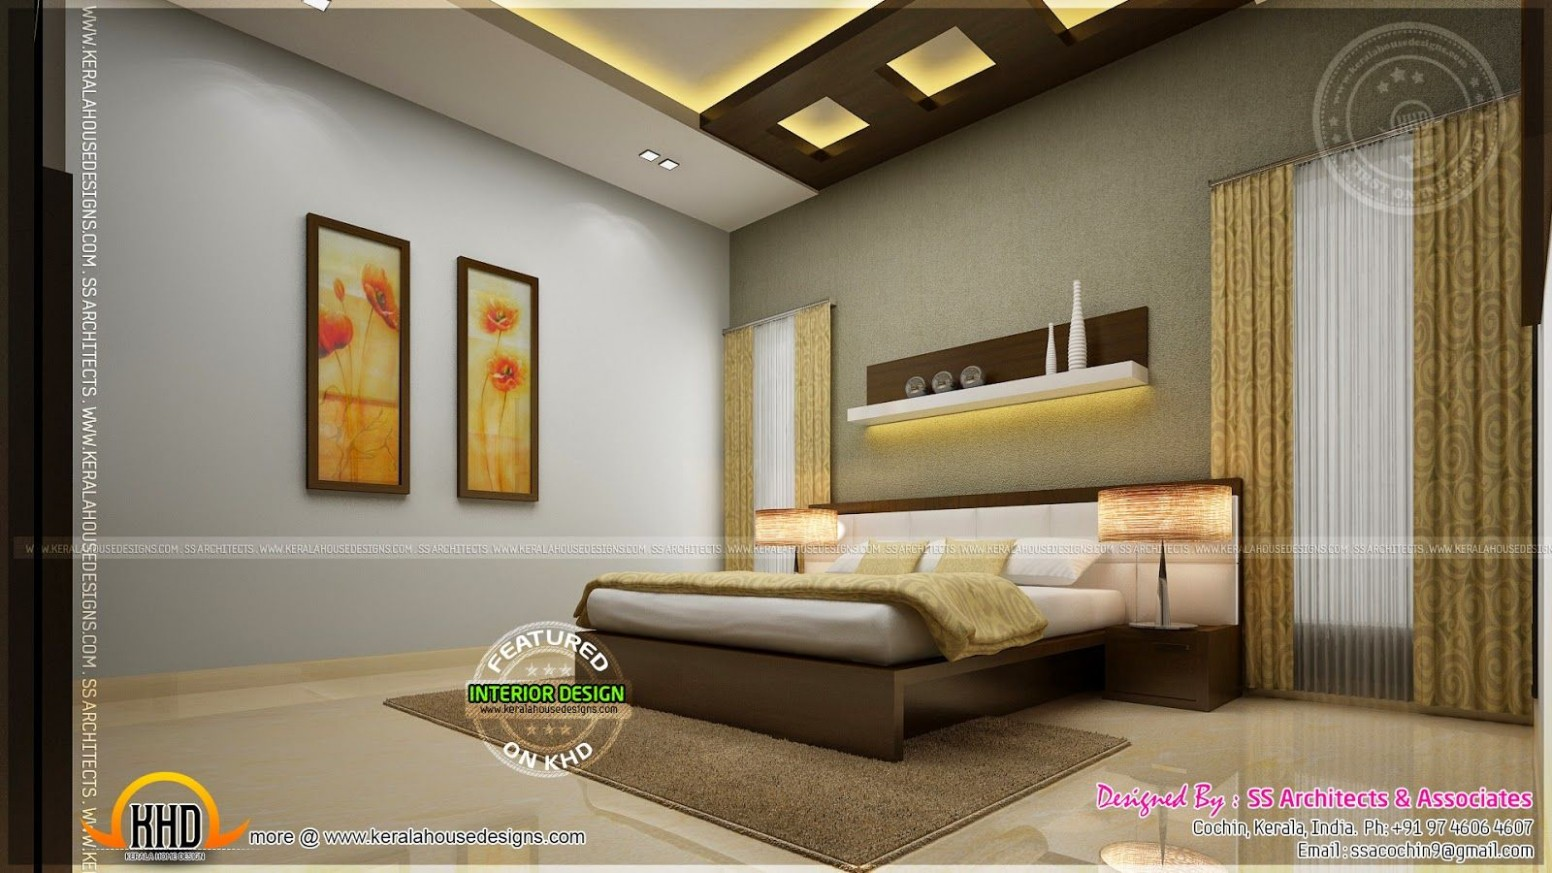 indian master bedroom interior design - Google Search  Master  - Bedroom Ideas India